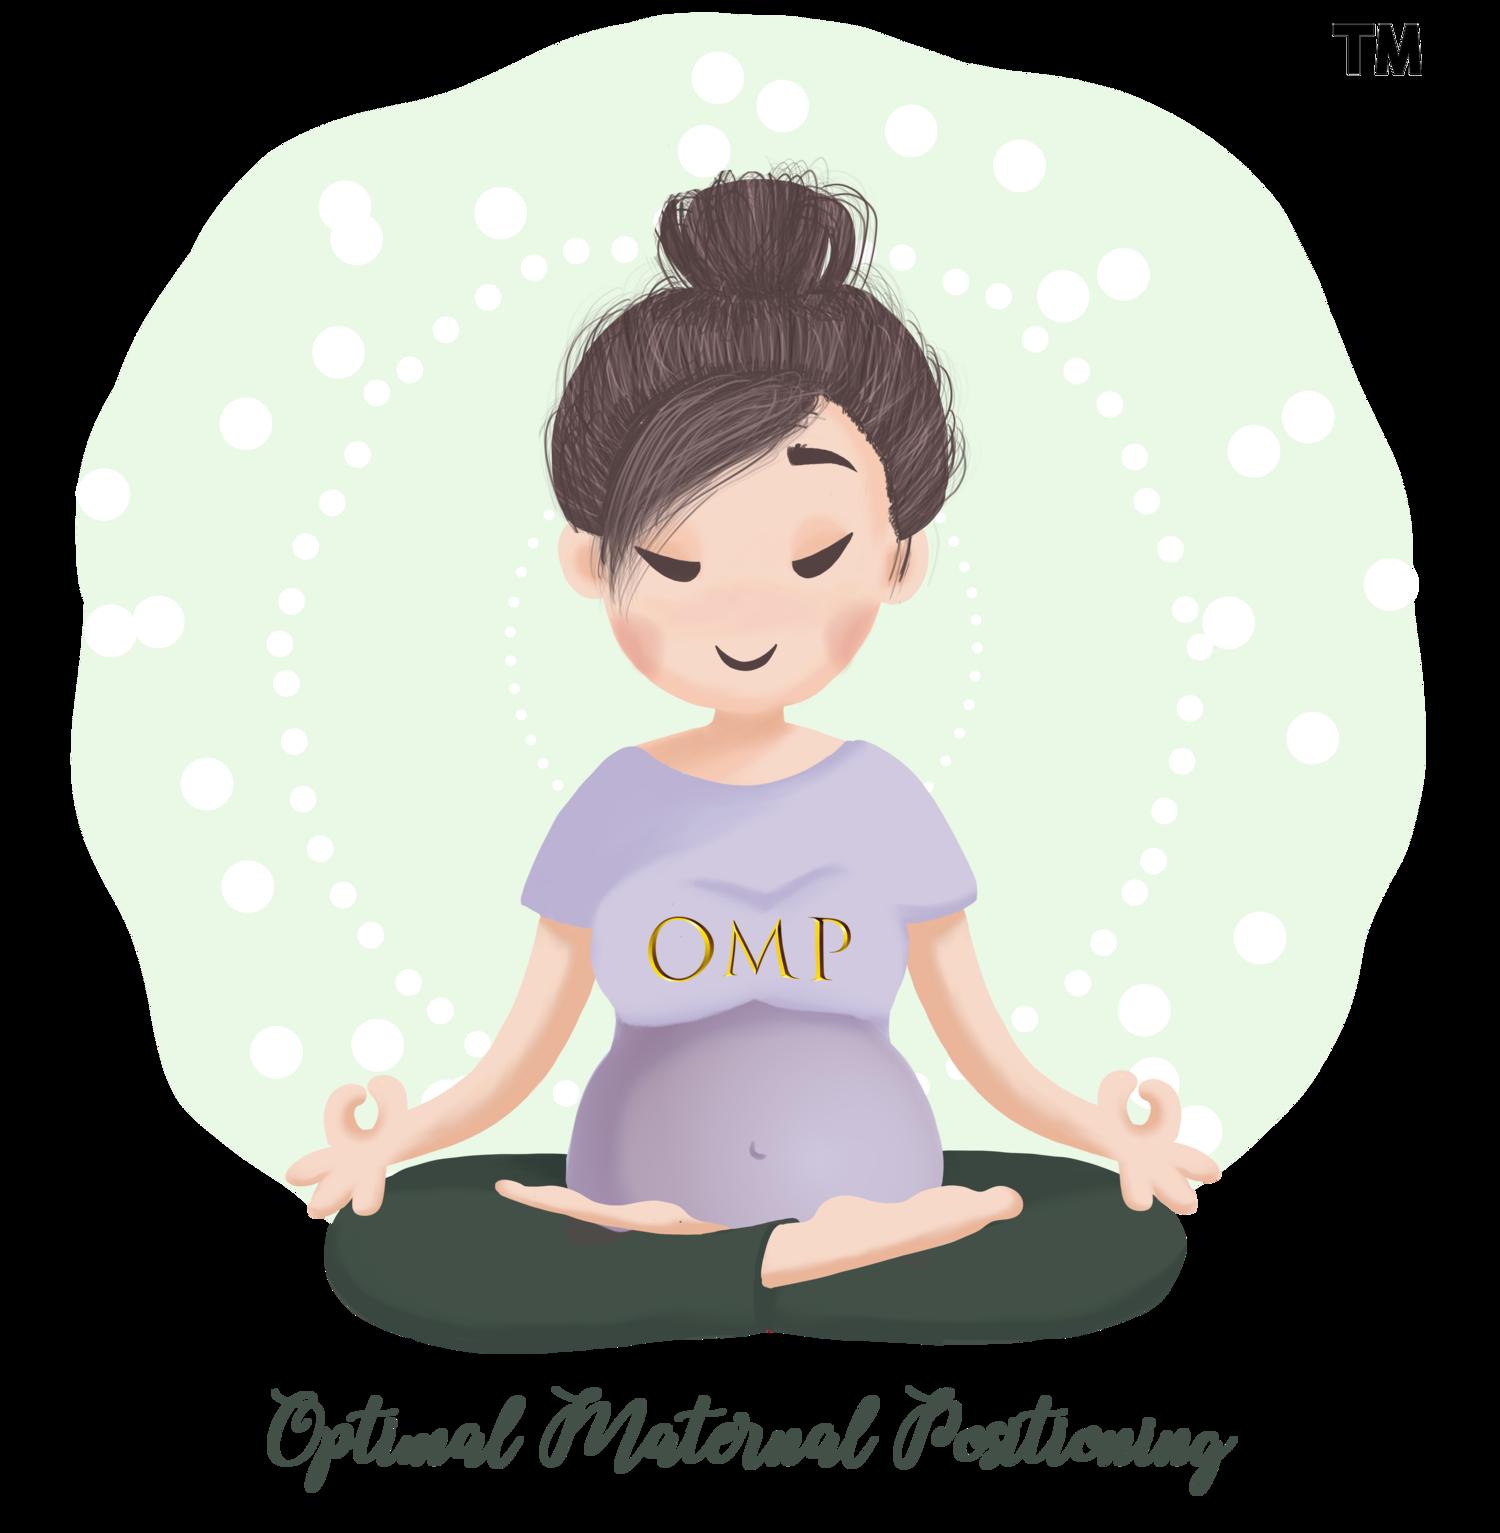 Optimal Maternal Positioning